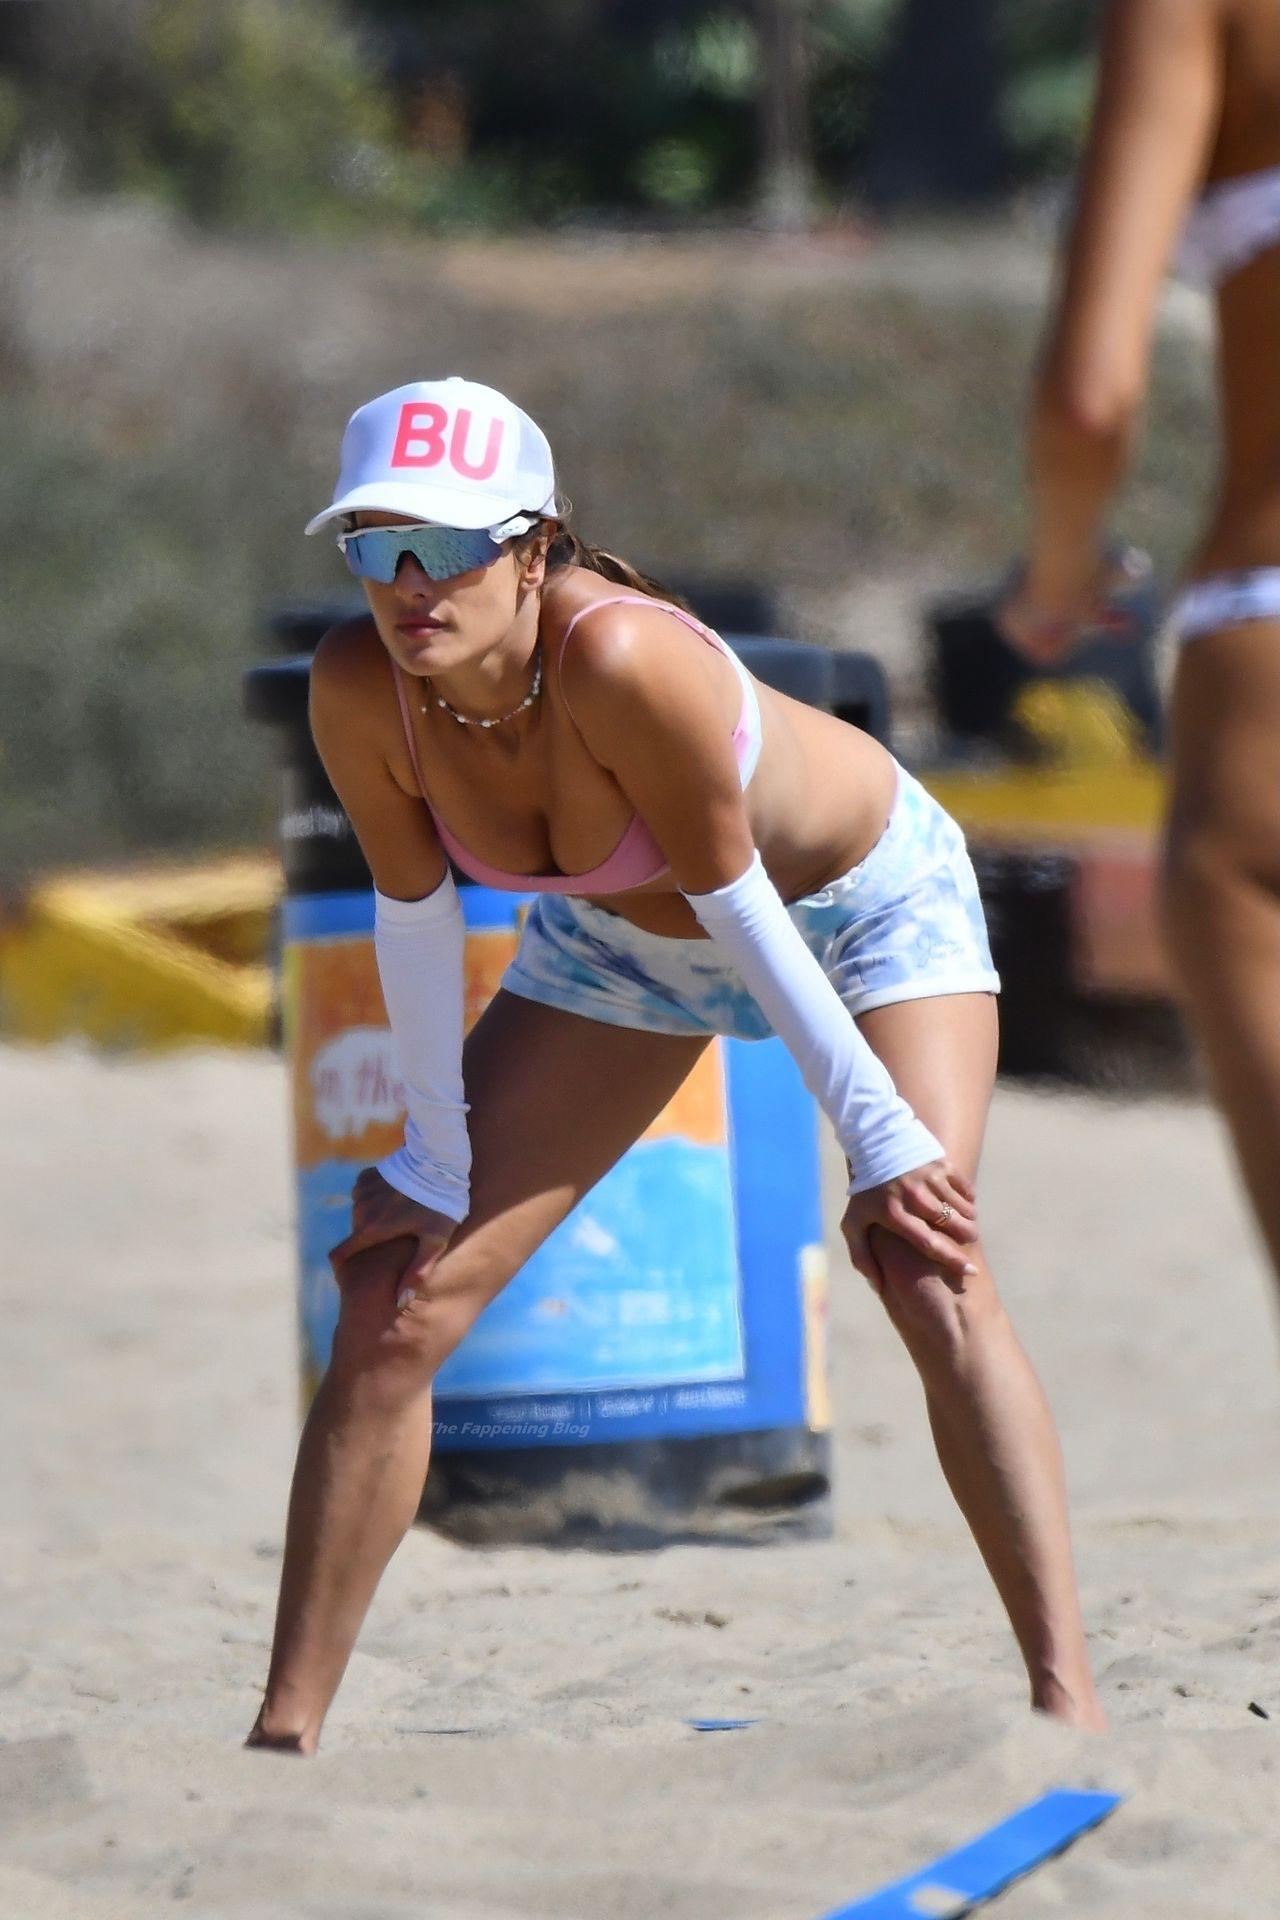 Alessandra-Ambrosio-Sexy-The-Fappening-Blog-95.jpg